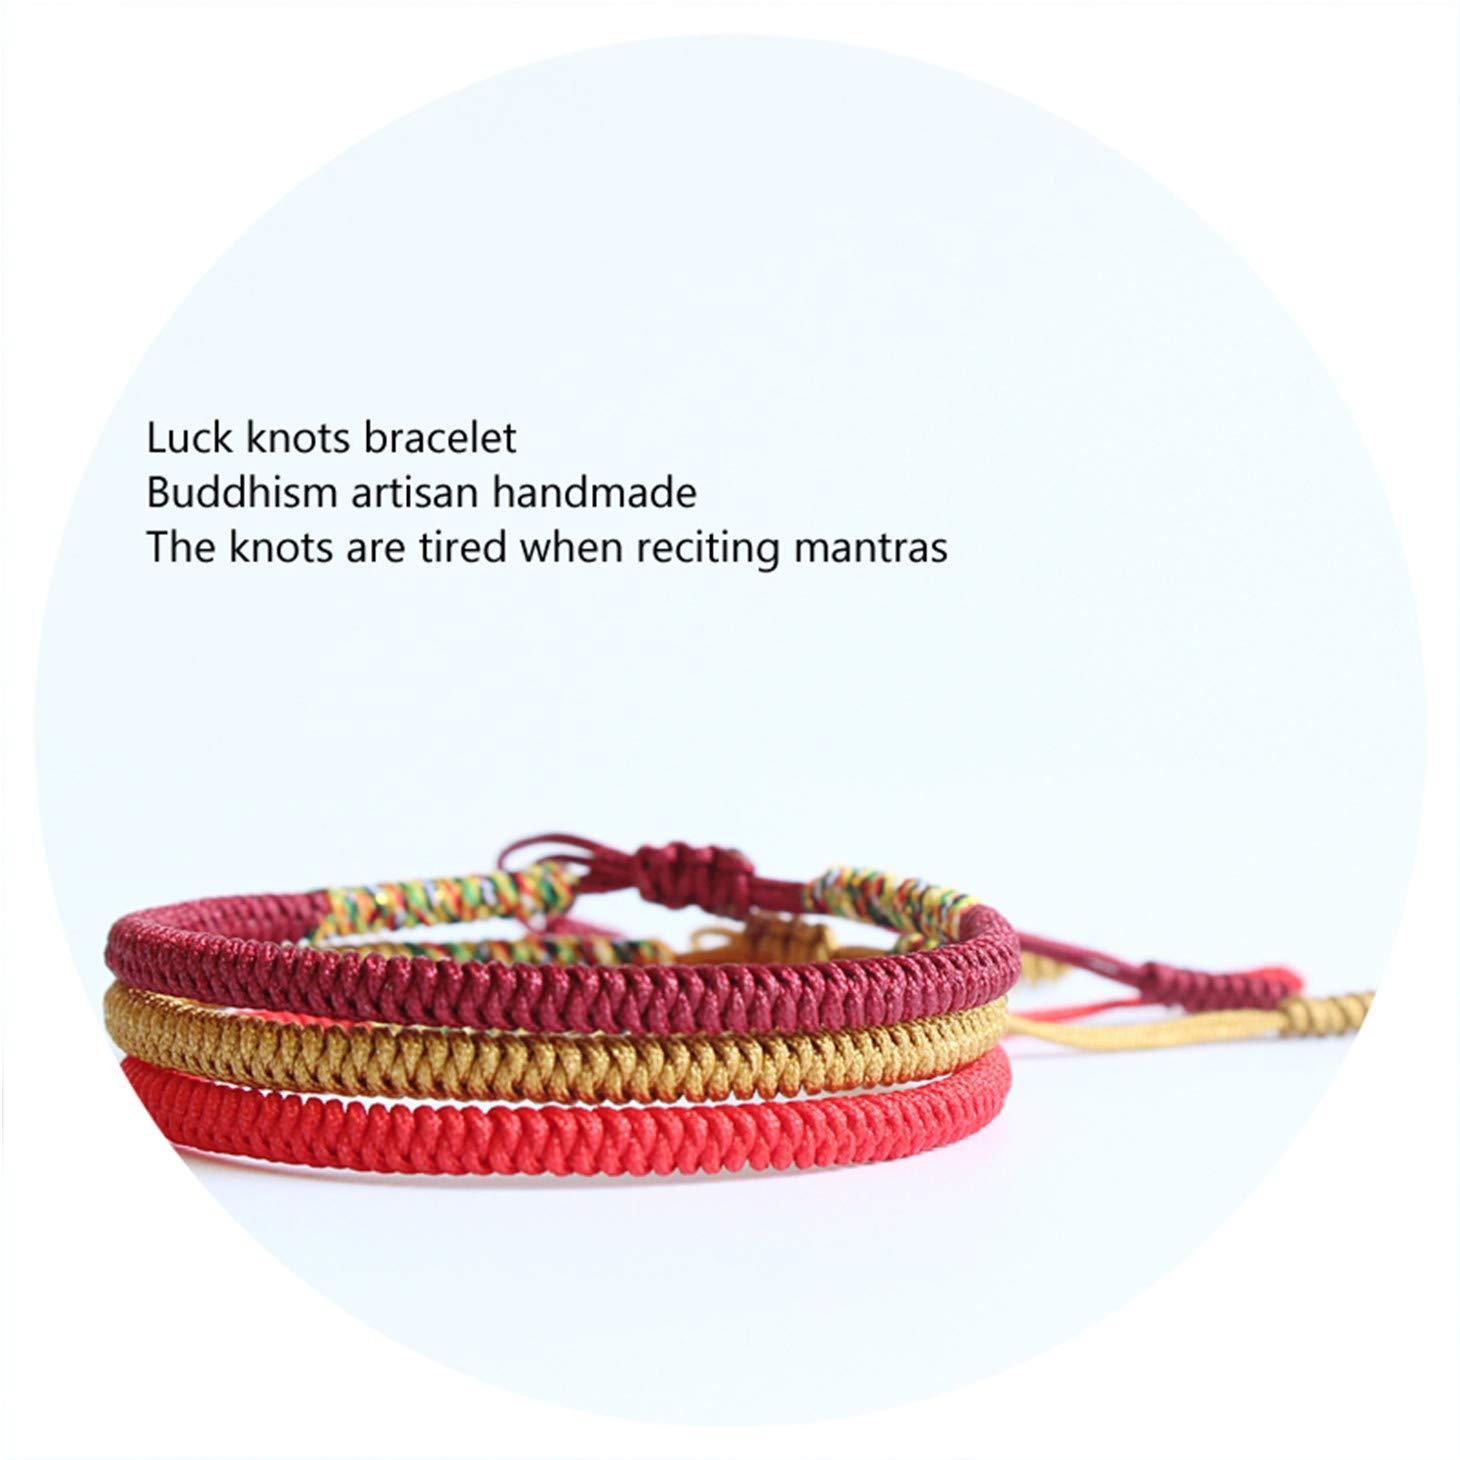 Olive Tayl 3PCS Multi Color Tibetan Buddhist Good Lucky Charm Tibetan Bracelets & Bangles for Women Men Handma by Olive Tayl (Image #3)